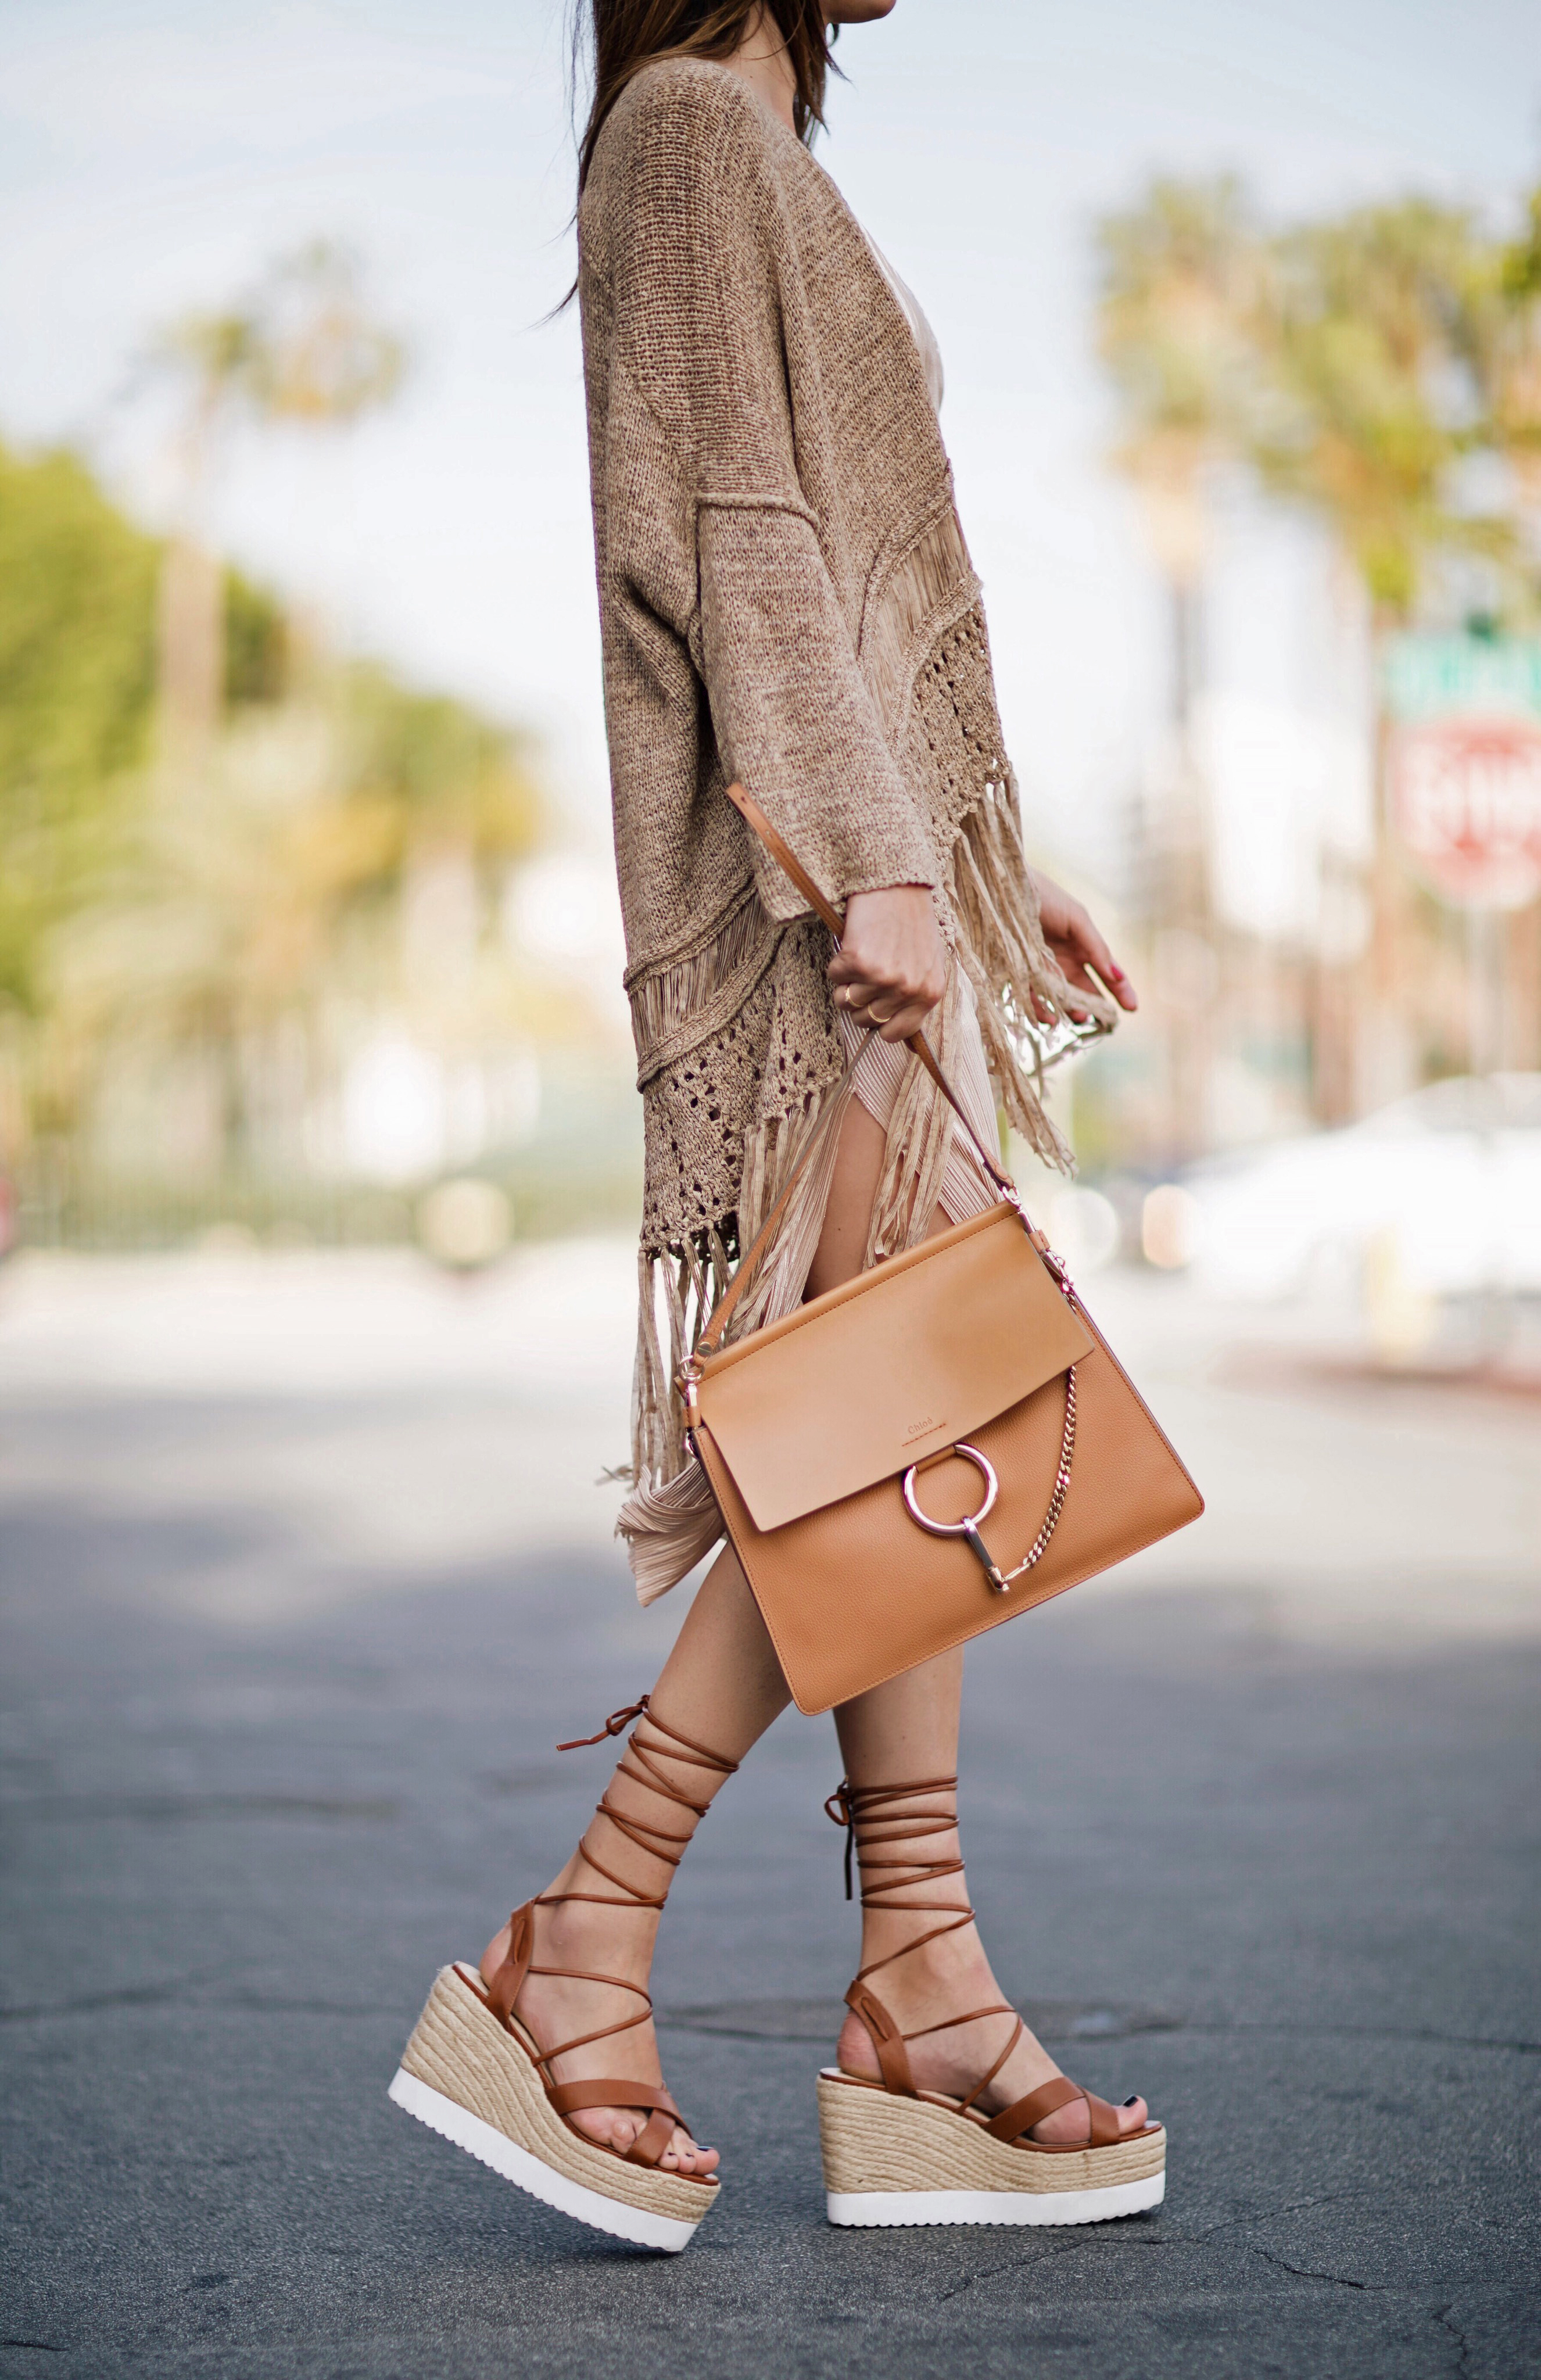 Laceup Flatform Sandals